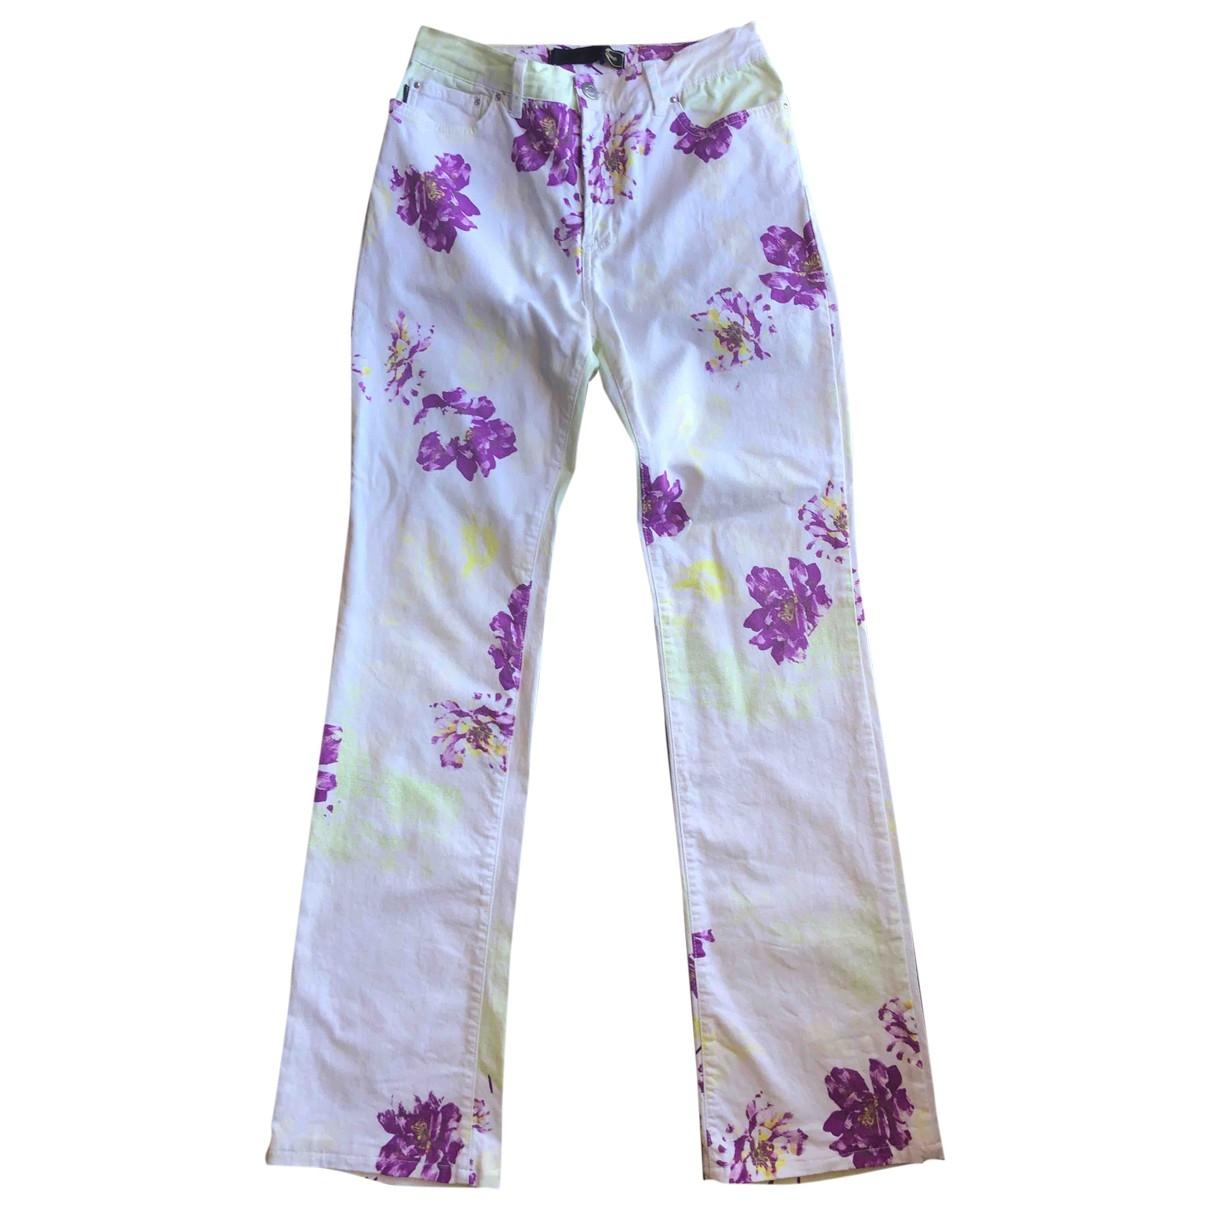 Pantalon en Algodon Multicolor Just Cavalli